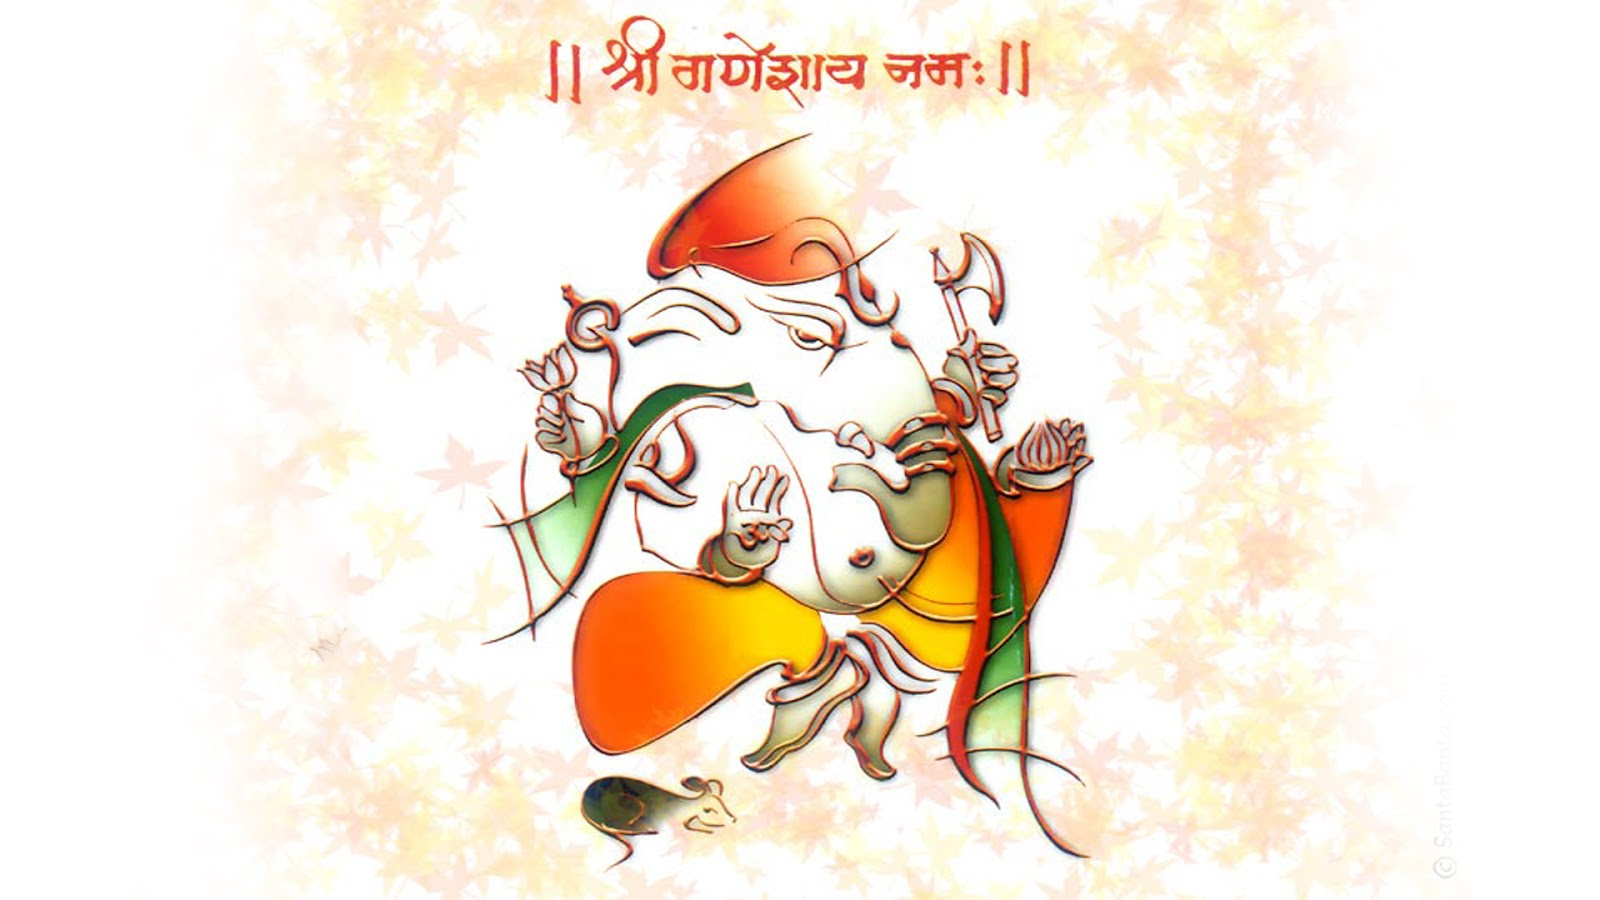 Ganapati Wallpaper Hd Lord Ganesha Hd Wallpapers Telugu Devotional Songs